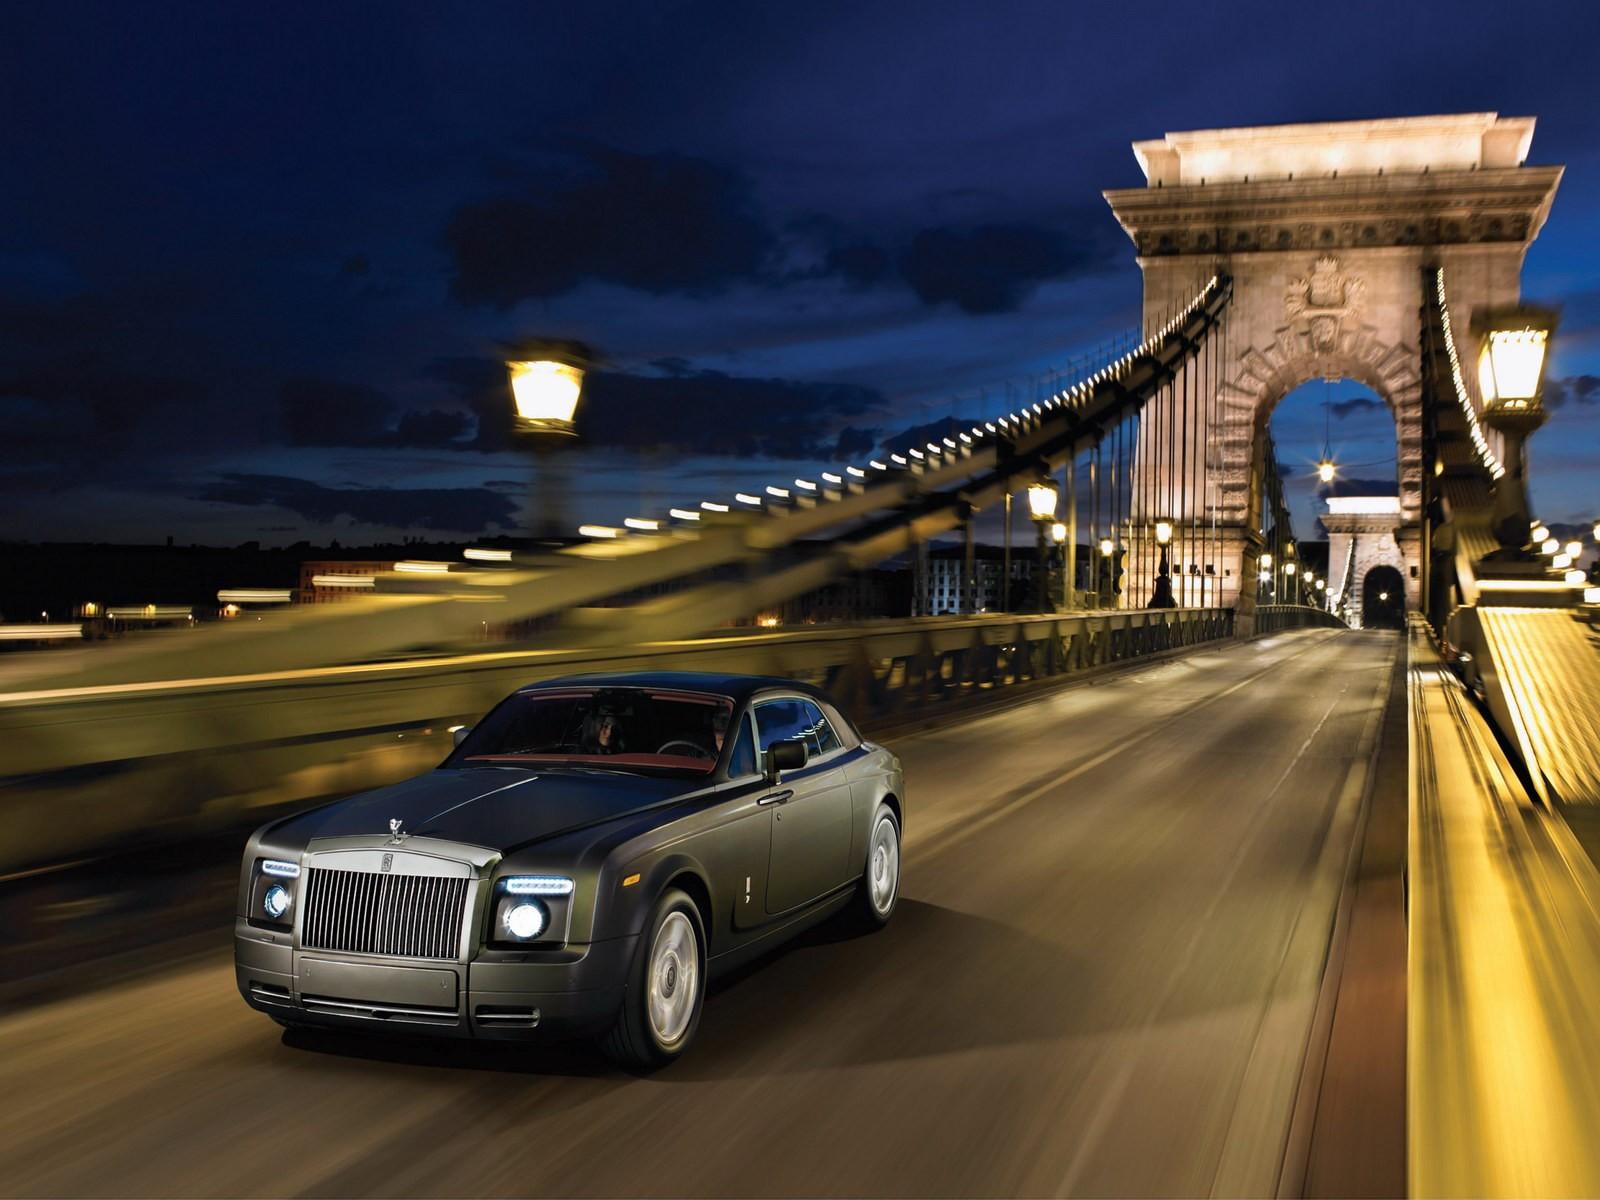 Wallpapers Rolls Royce Cars